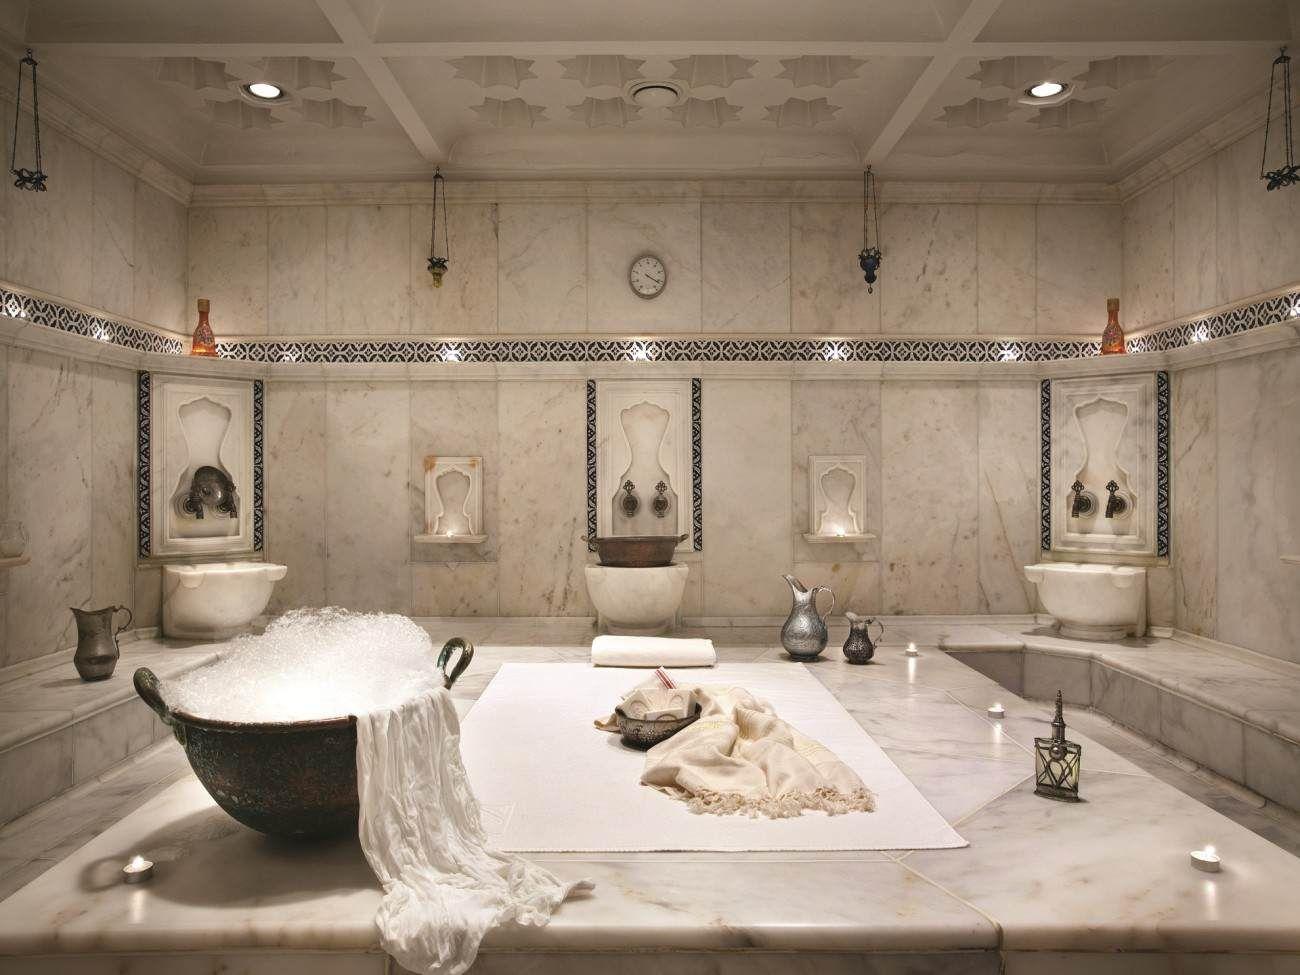 Turkish Bath With Images Turkish Bath Bathroom Design Luxury Spa